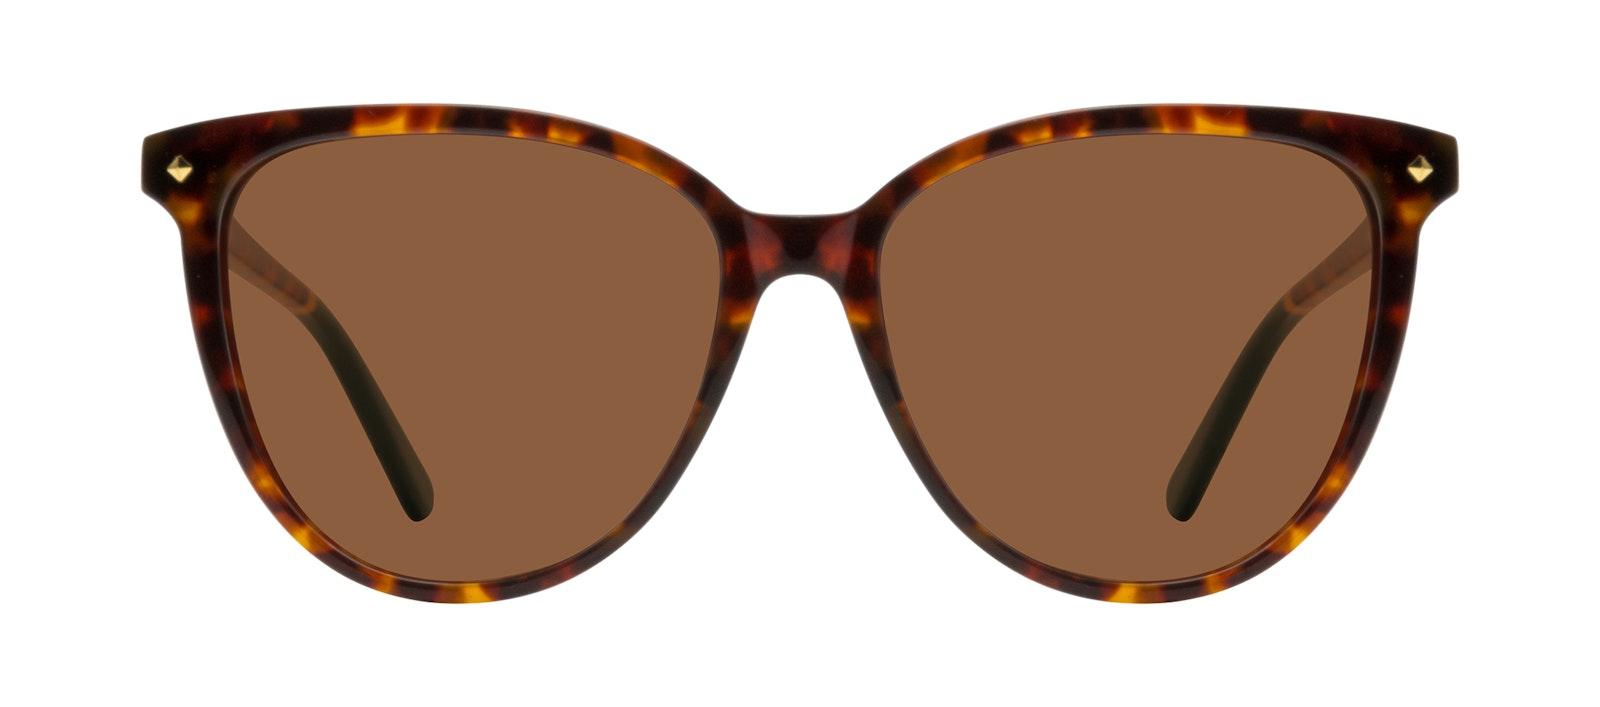 Affordable Fashion Glasses Sunglasses Women Jane Tortoise Front